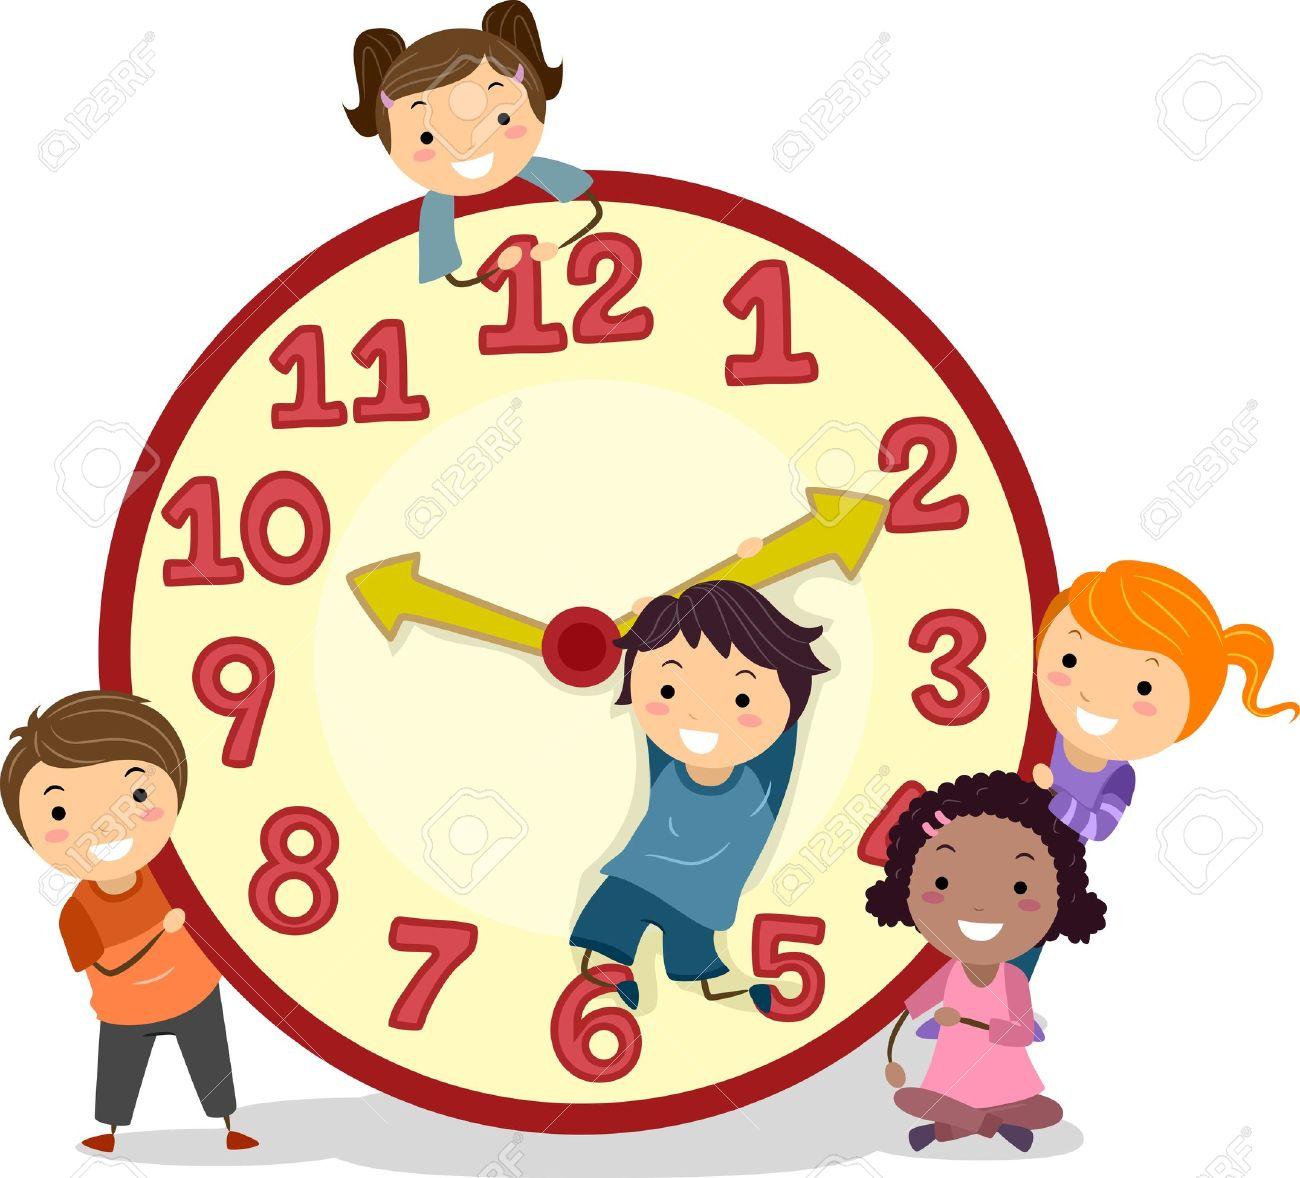 Ilustracion De Stickman Ninos En Un Gran Reloj